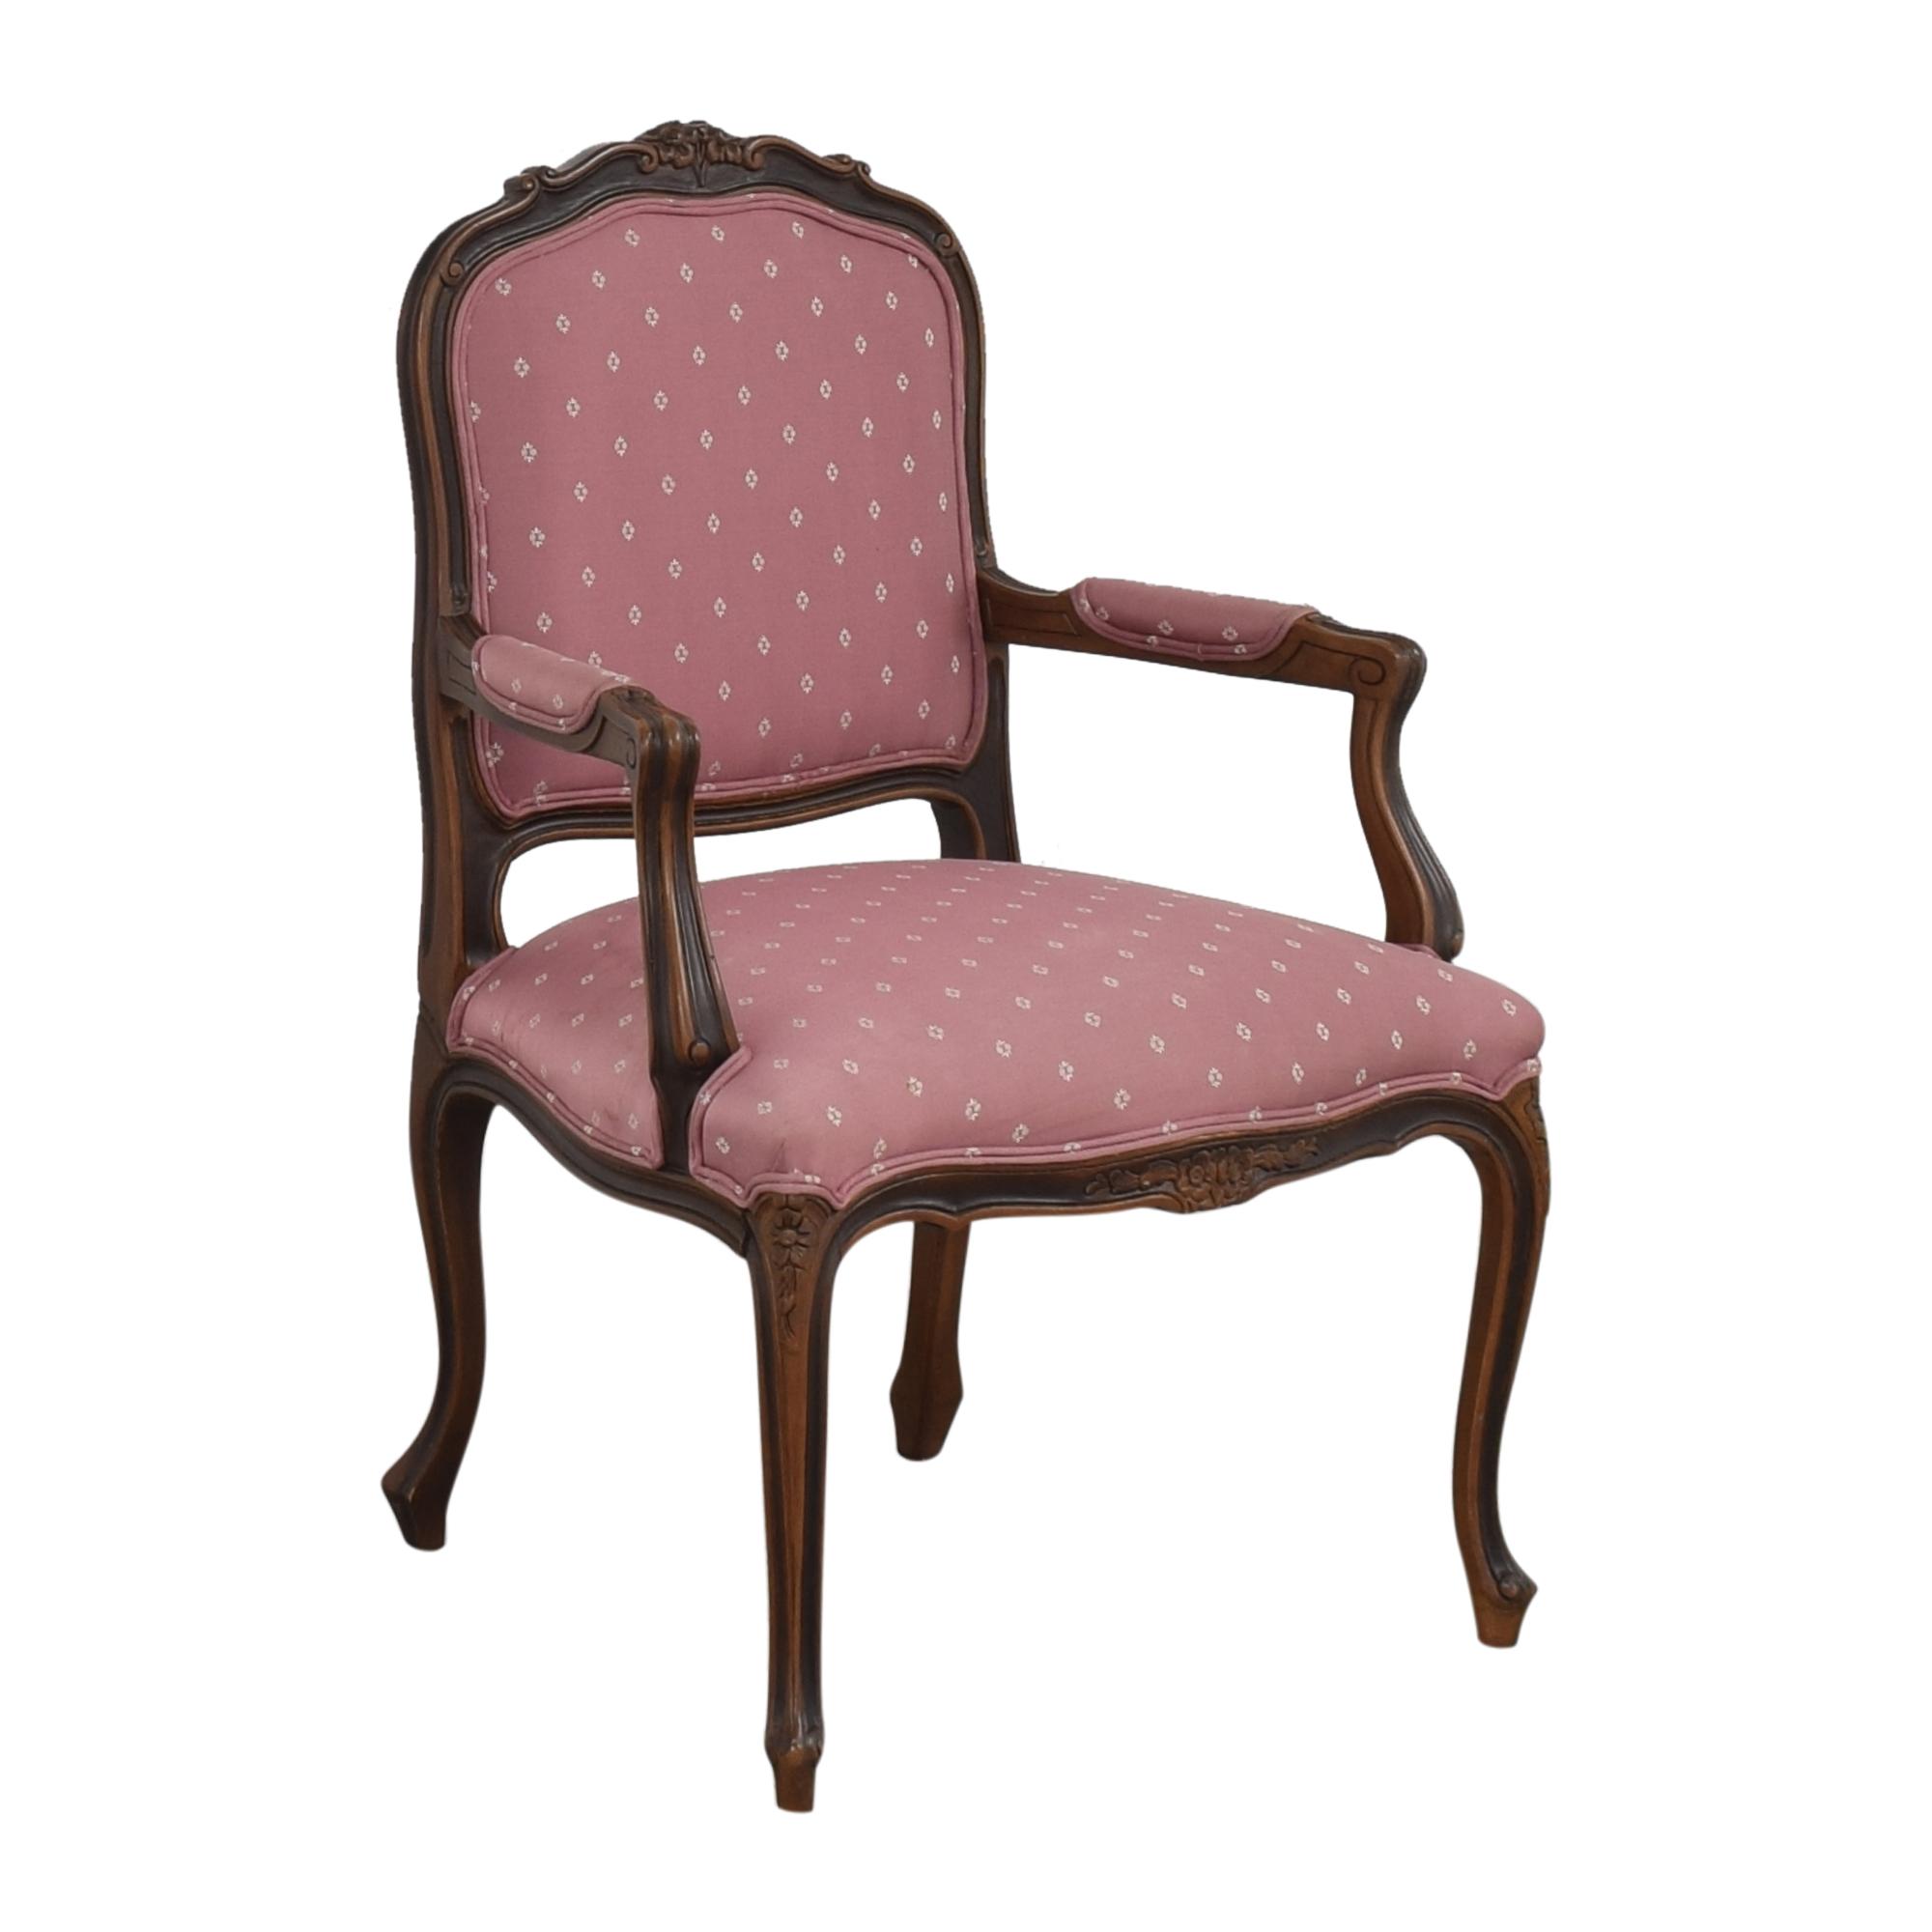 Ethan Allen Ethan Allen Accent Chair on sale